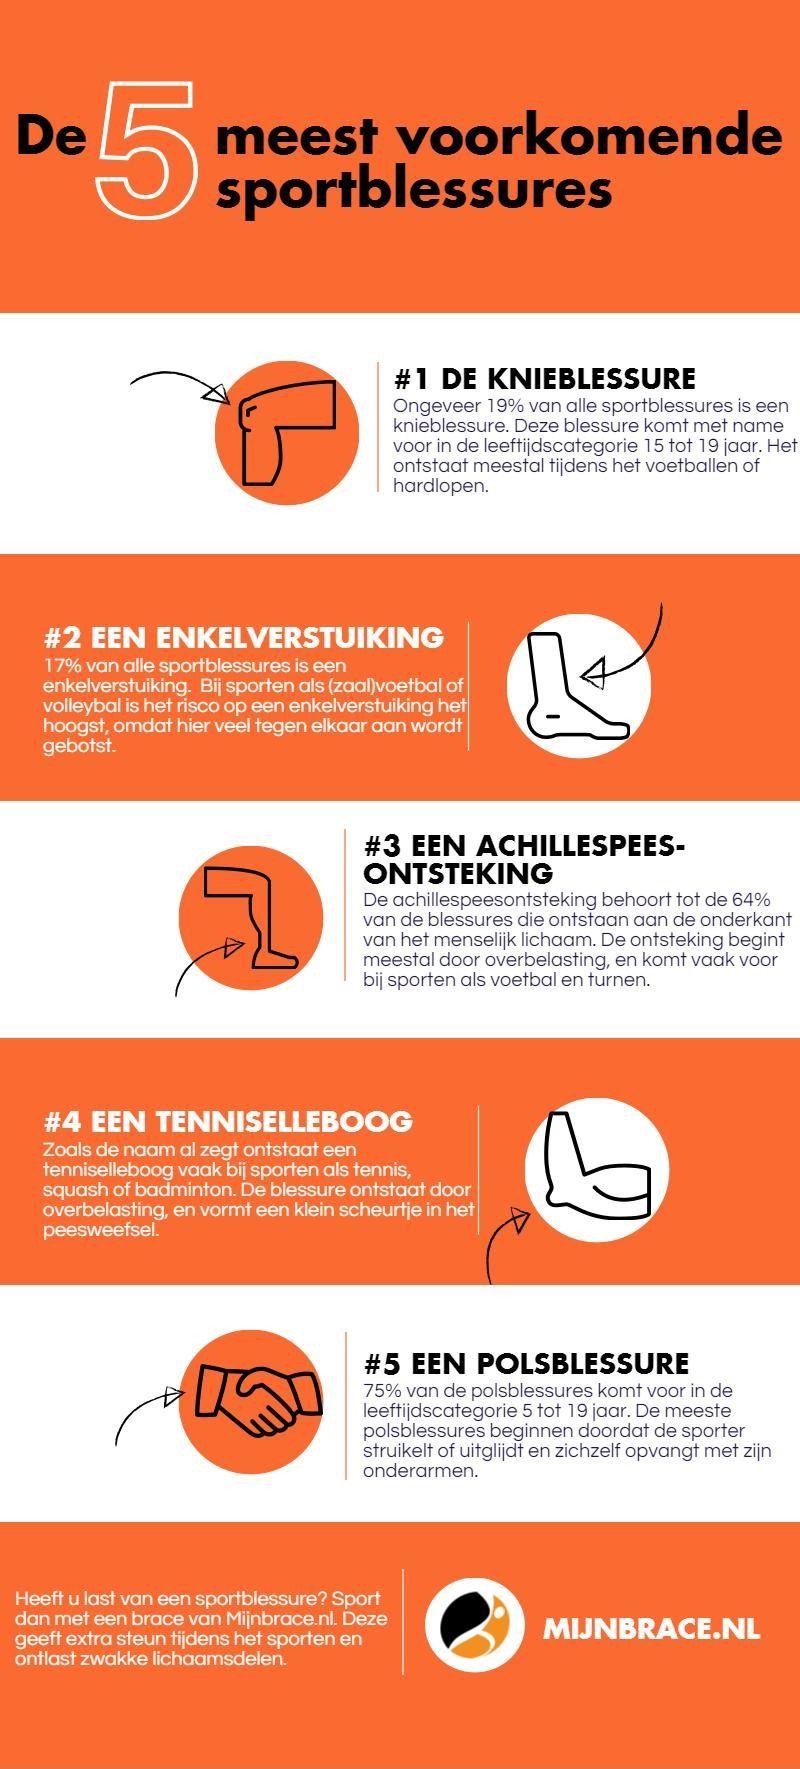 infographic 5 meest voorkomende sportblessures